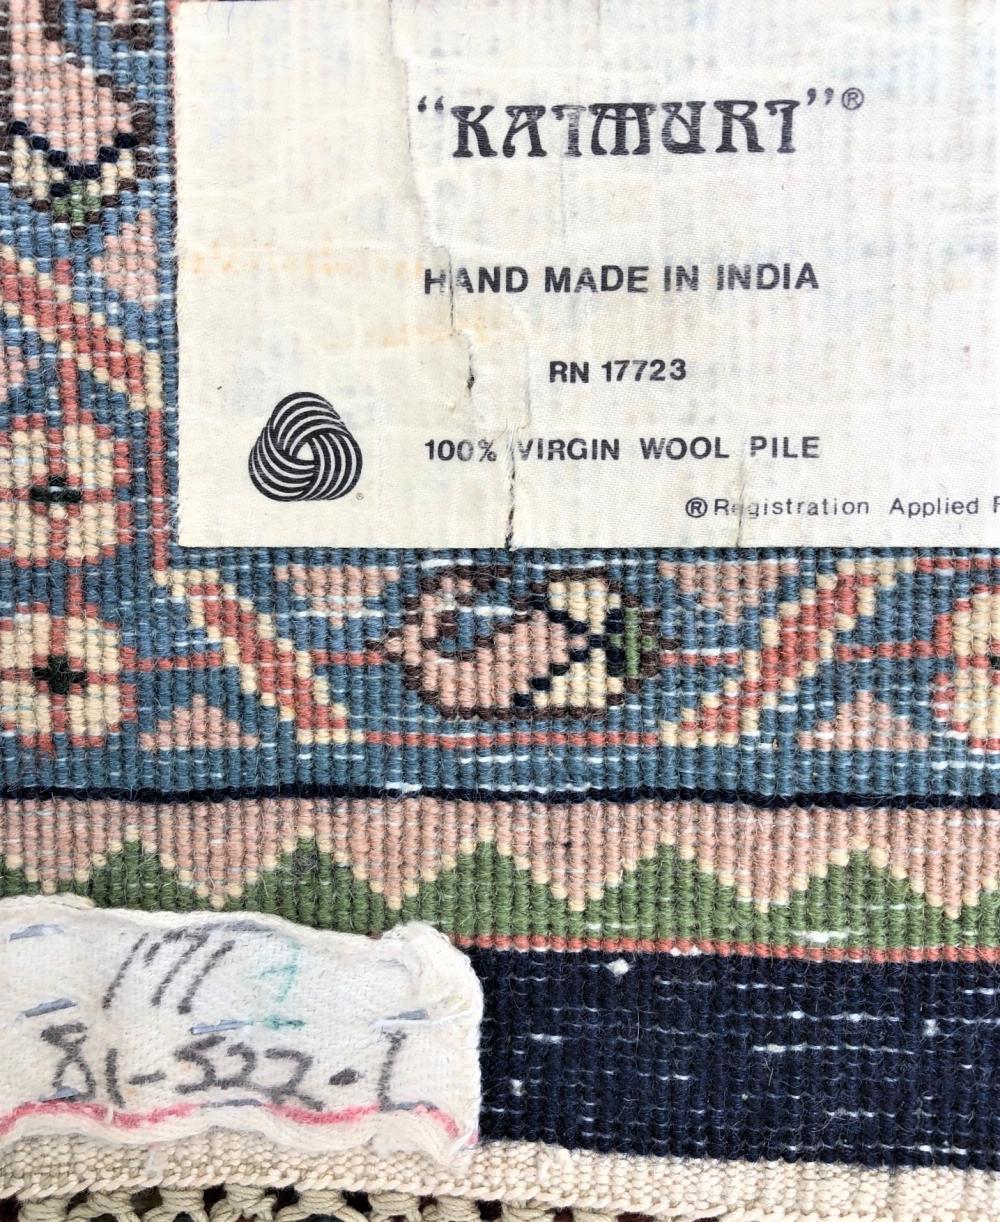 INDIAN SIGNED KATMURT LILIHAN DESIGN HAND KNOTTED RUG - 8.2 x 9.10